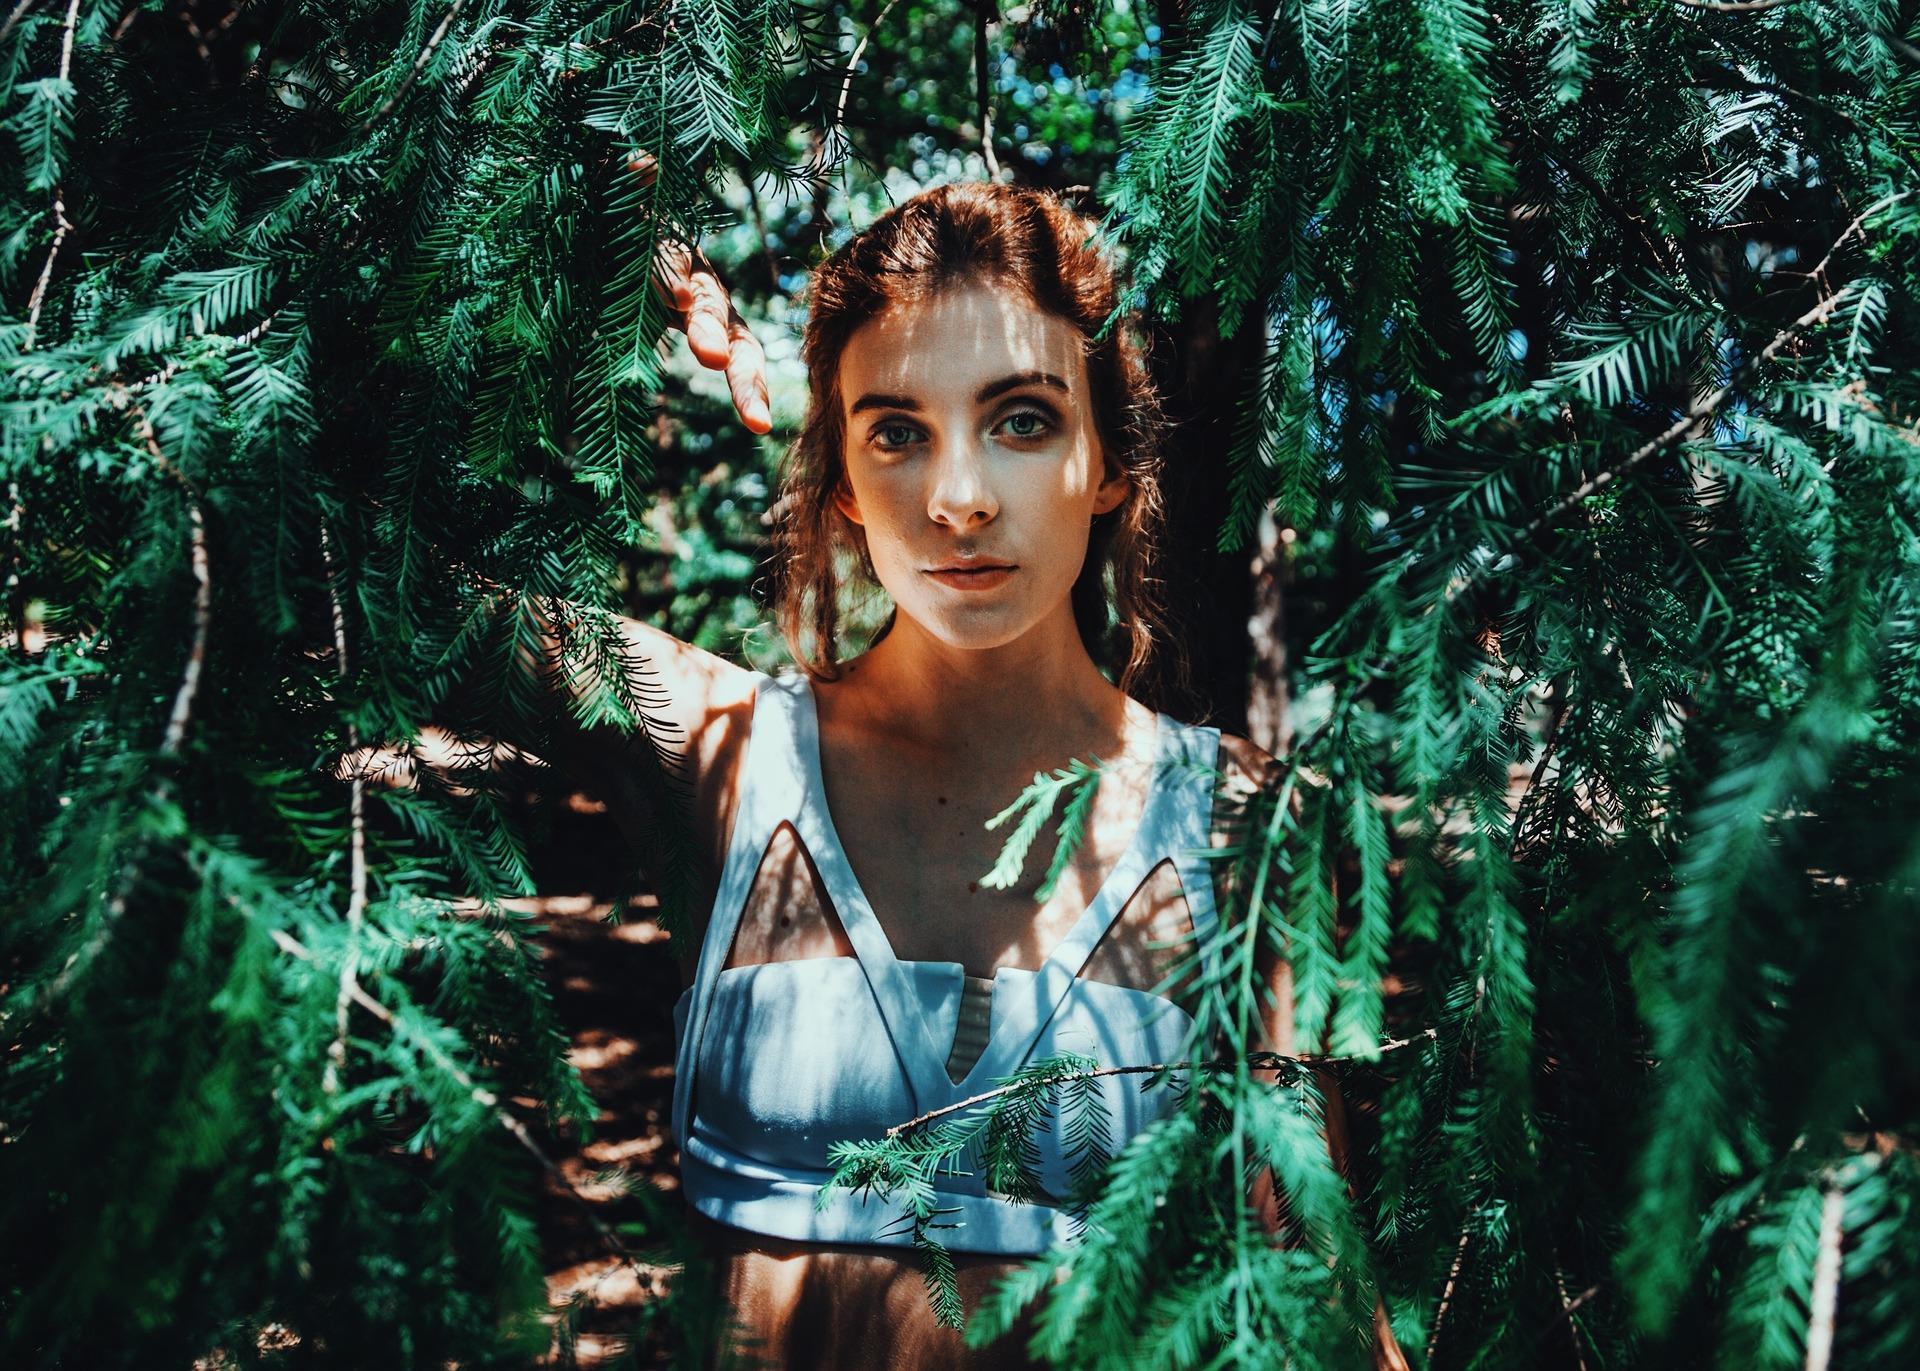 Nicole LianeM